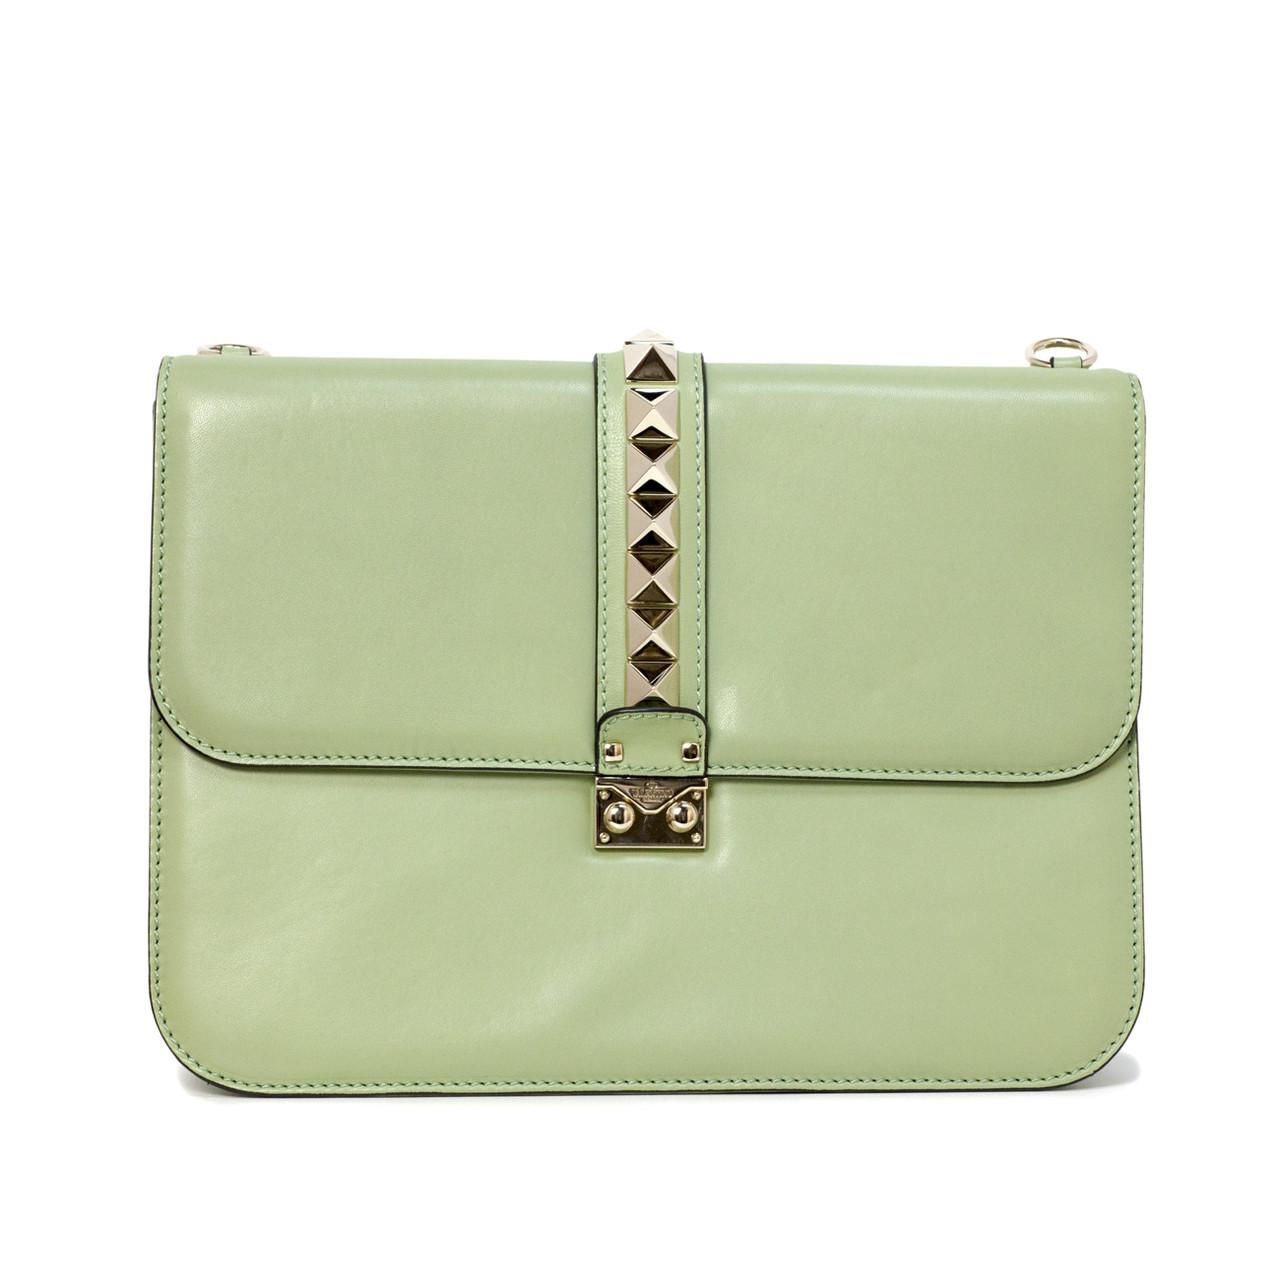 ba37f4bb689d2 Valentino Mint Green Large Glam Lock Rockstud Flap Bag - modaselle